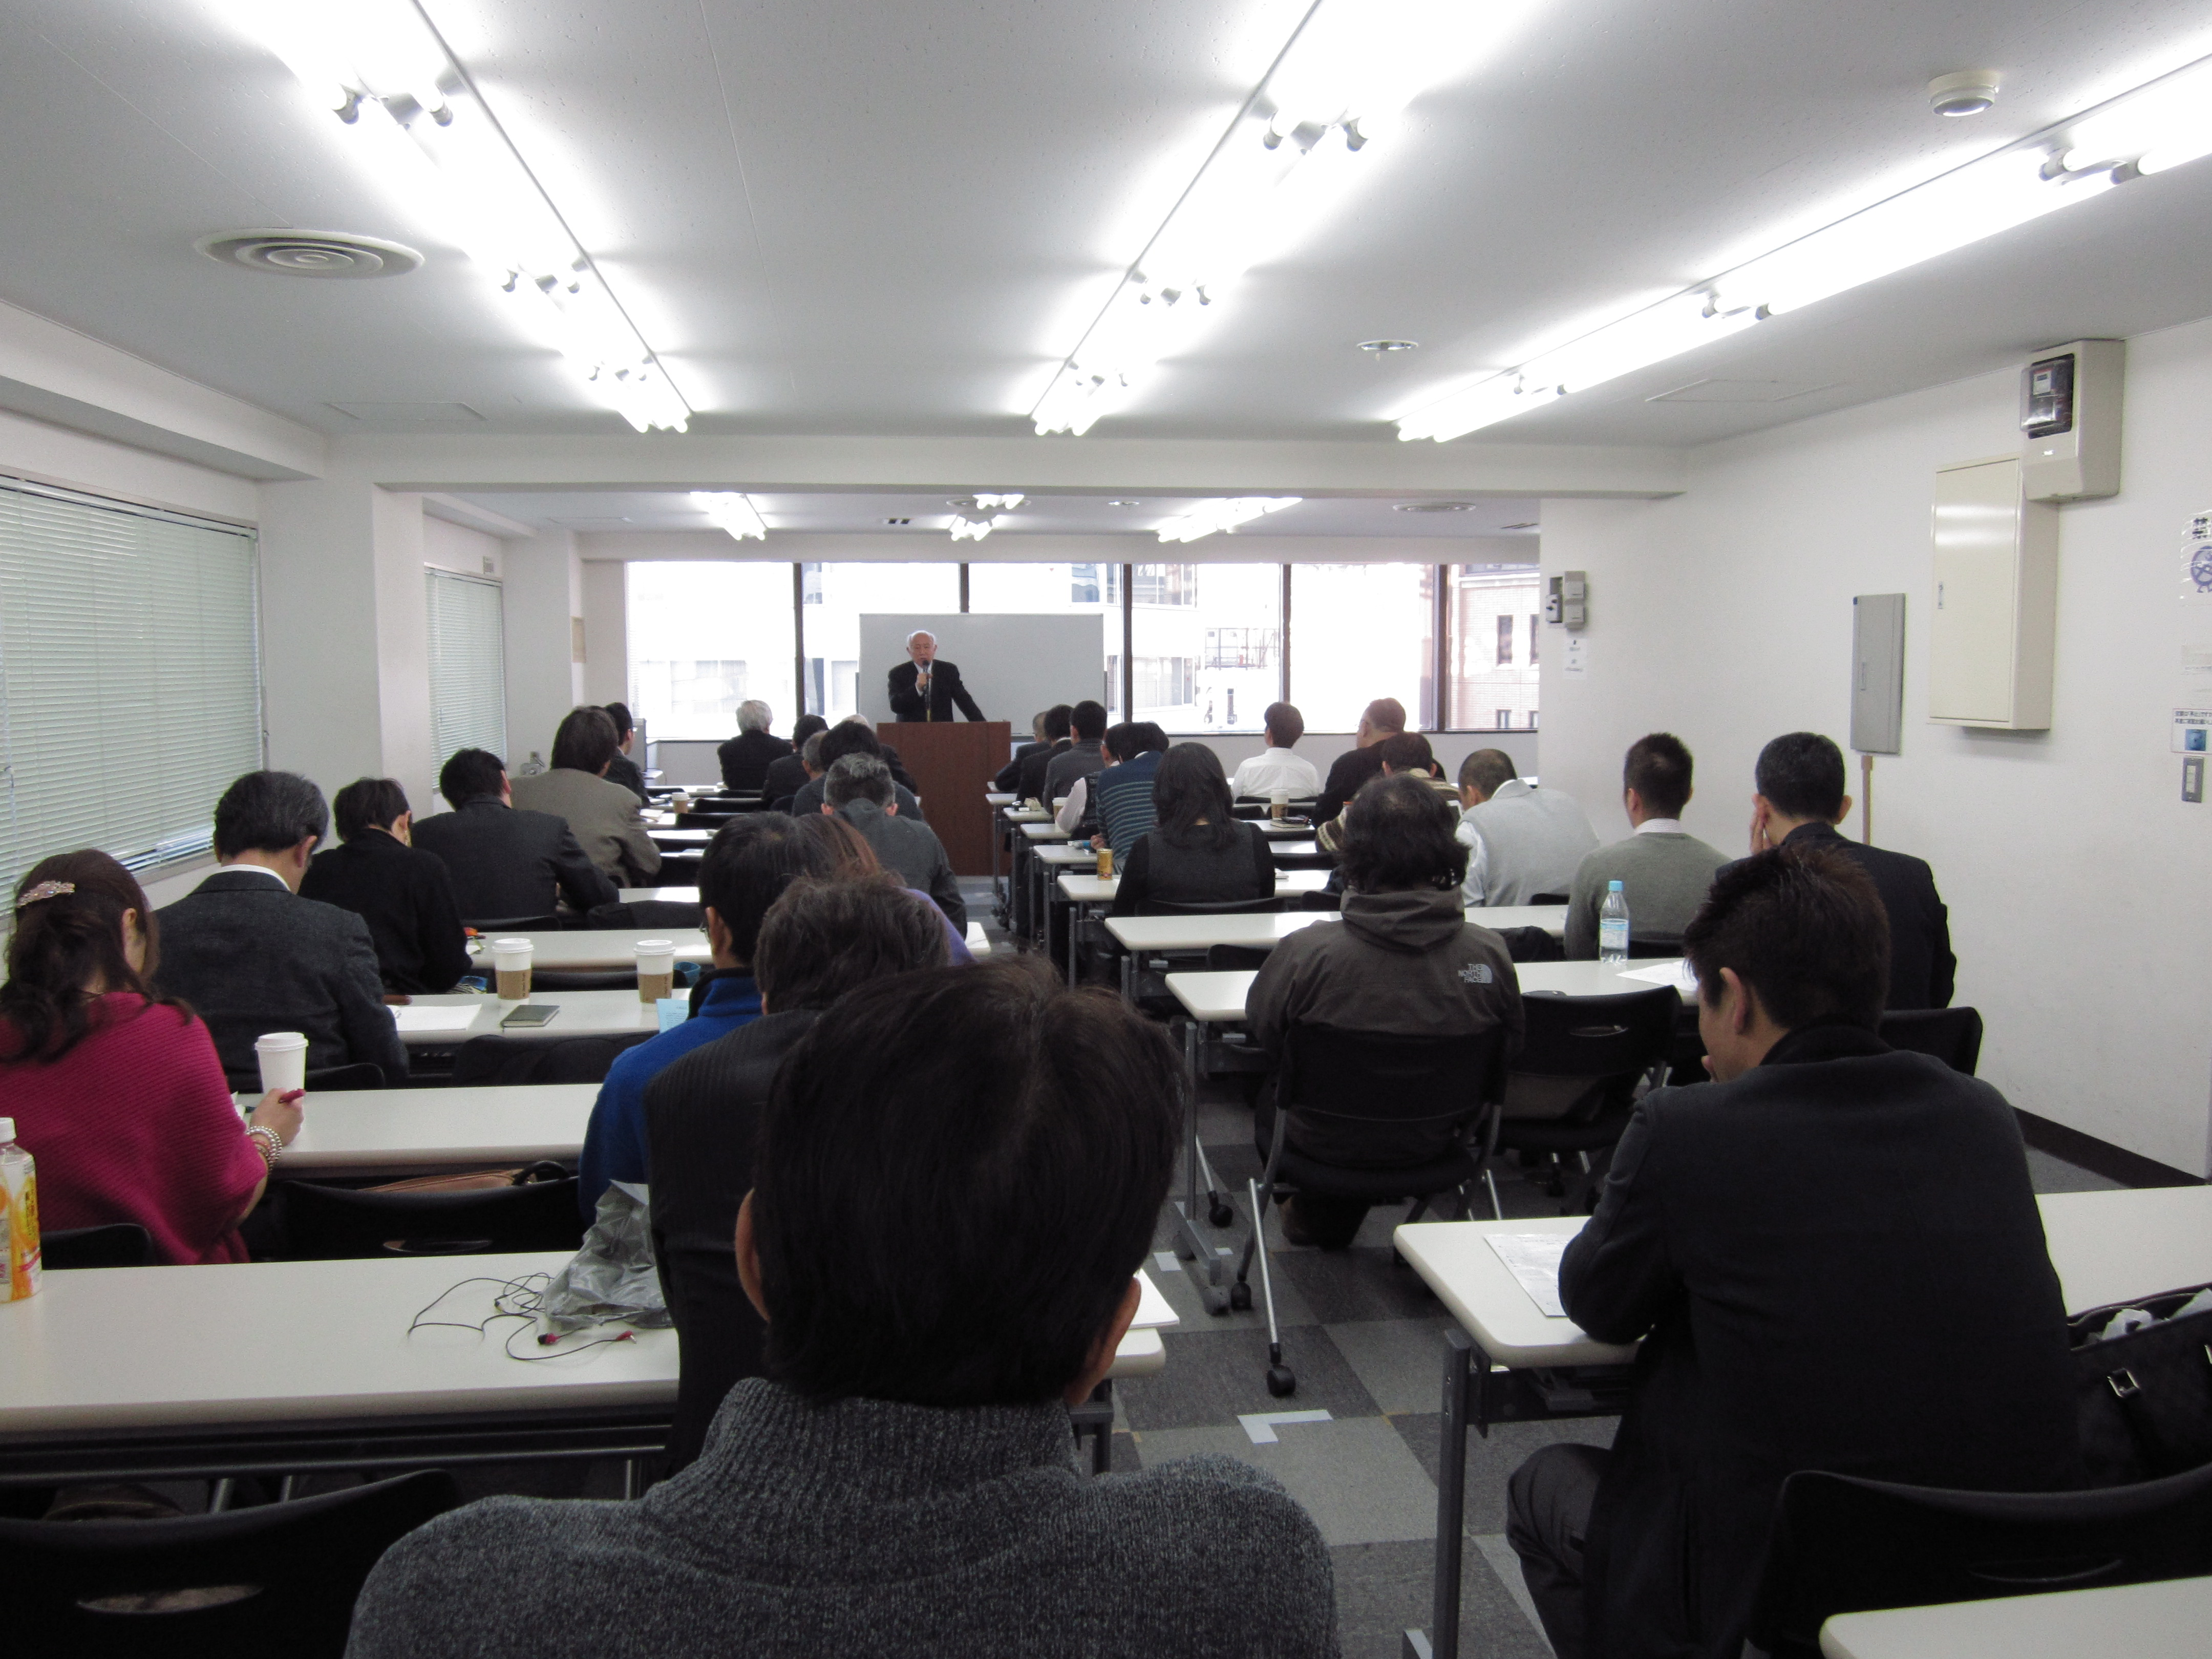 IMG 5603 - 4月1日東京思風塾の開催になります。